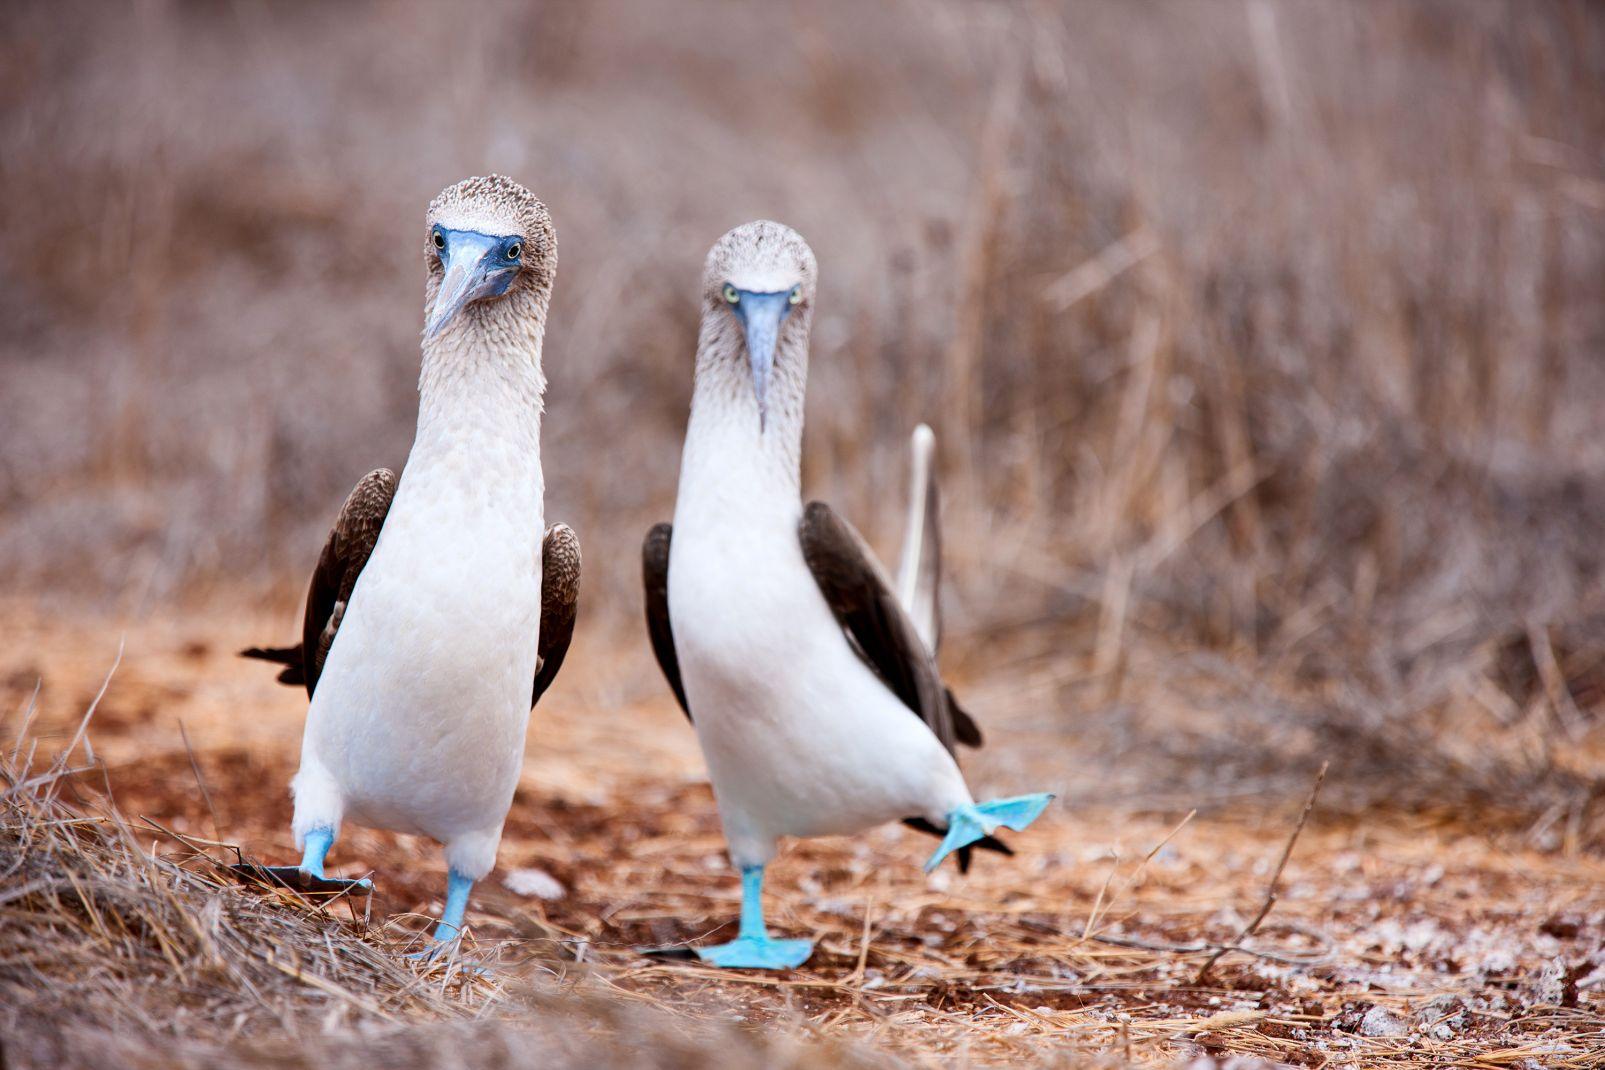 Ecuador and Galapagos Islands